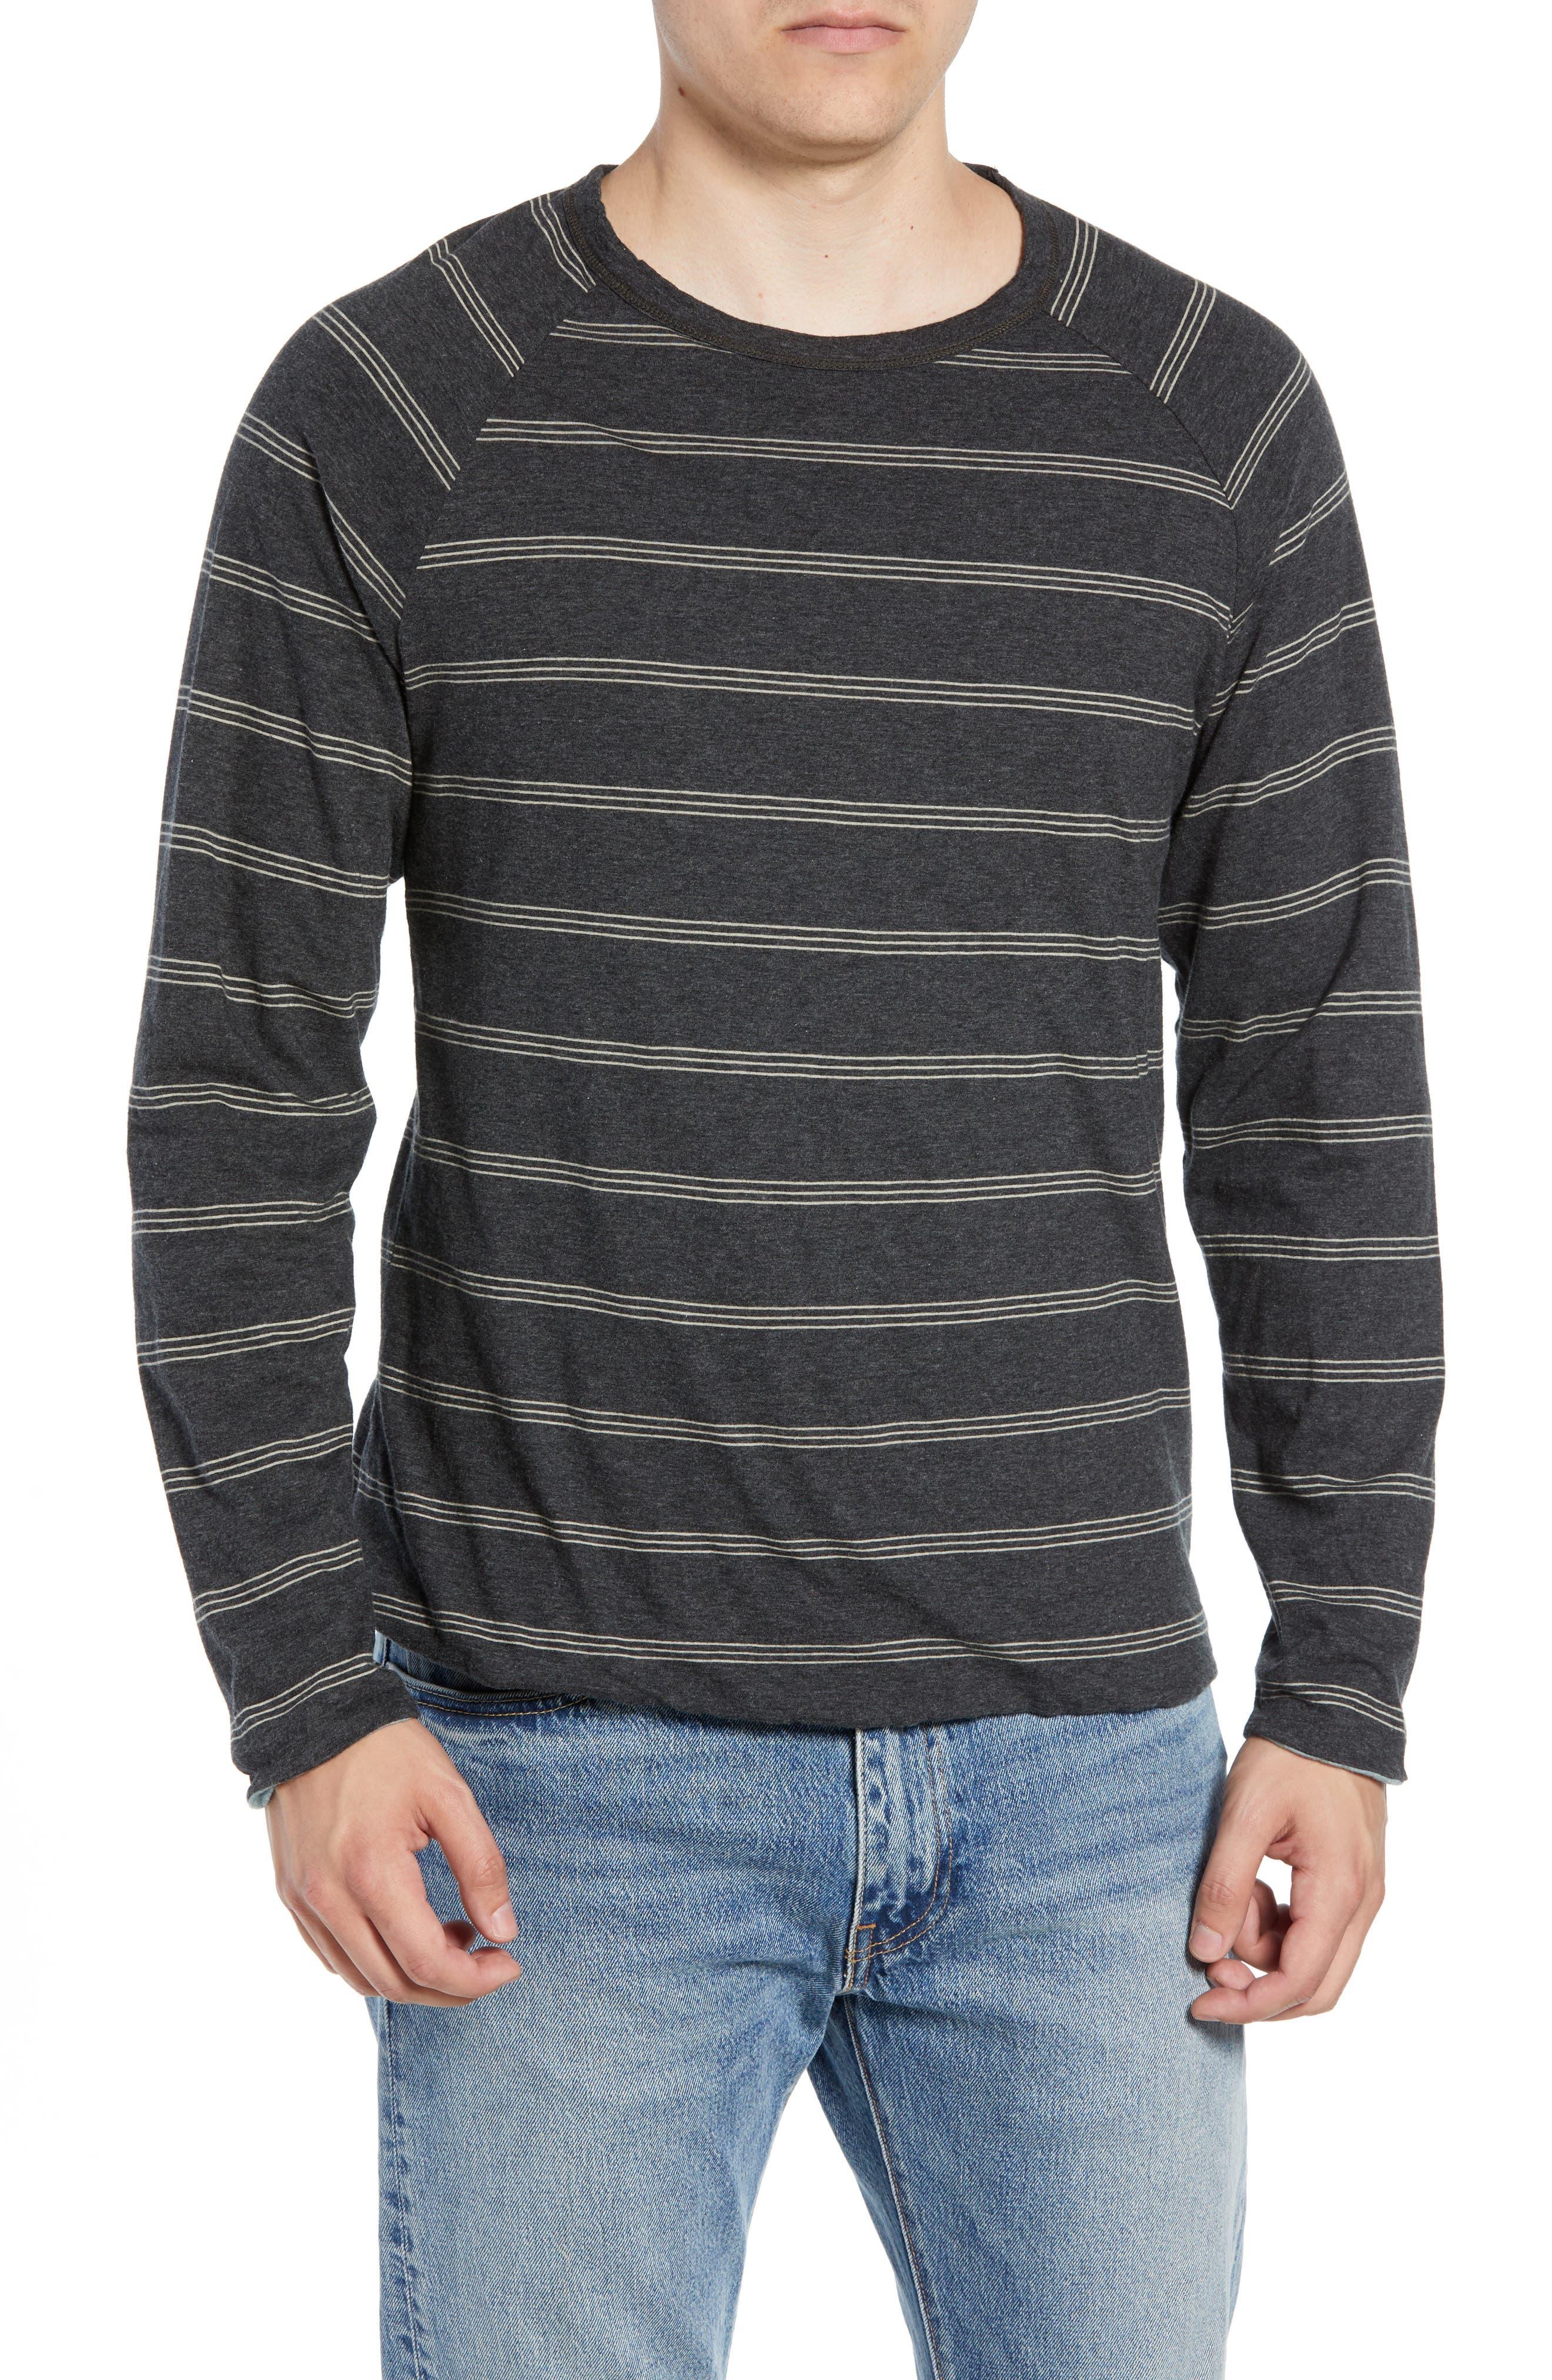 Gunnison Reversible Raglan Sleeve T-Shirt,                         Main,                         color, PHANTOM HEATHER